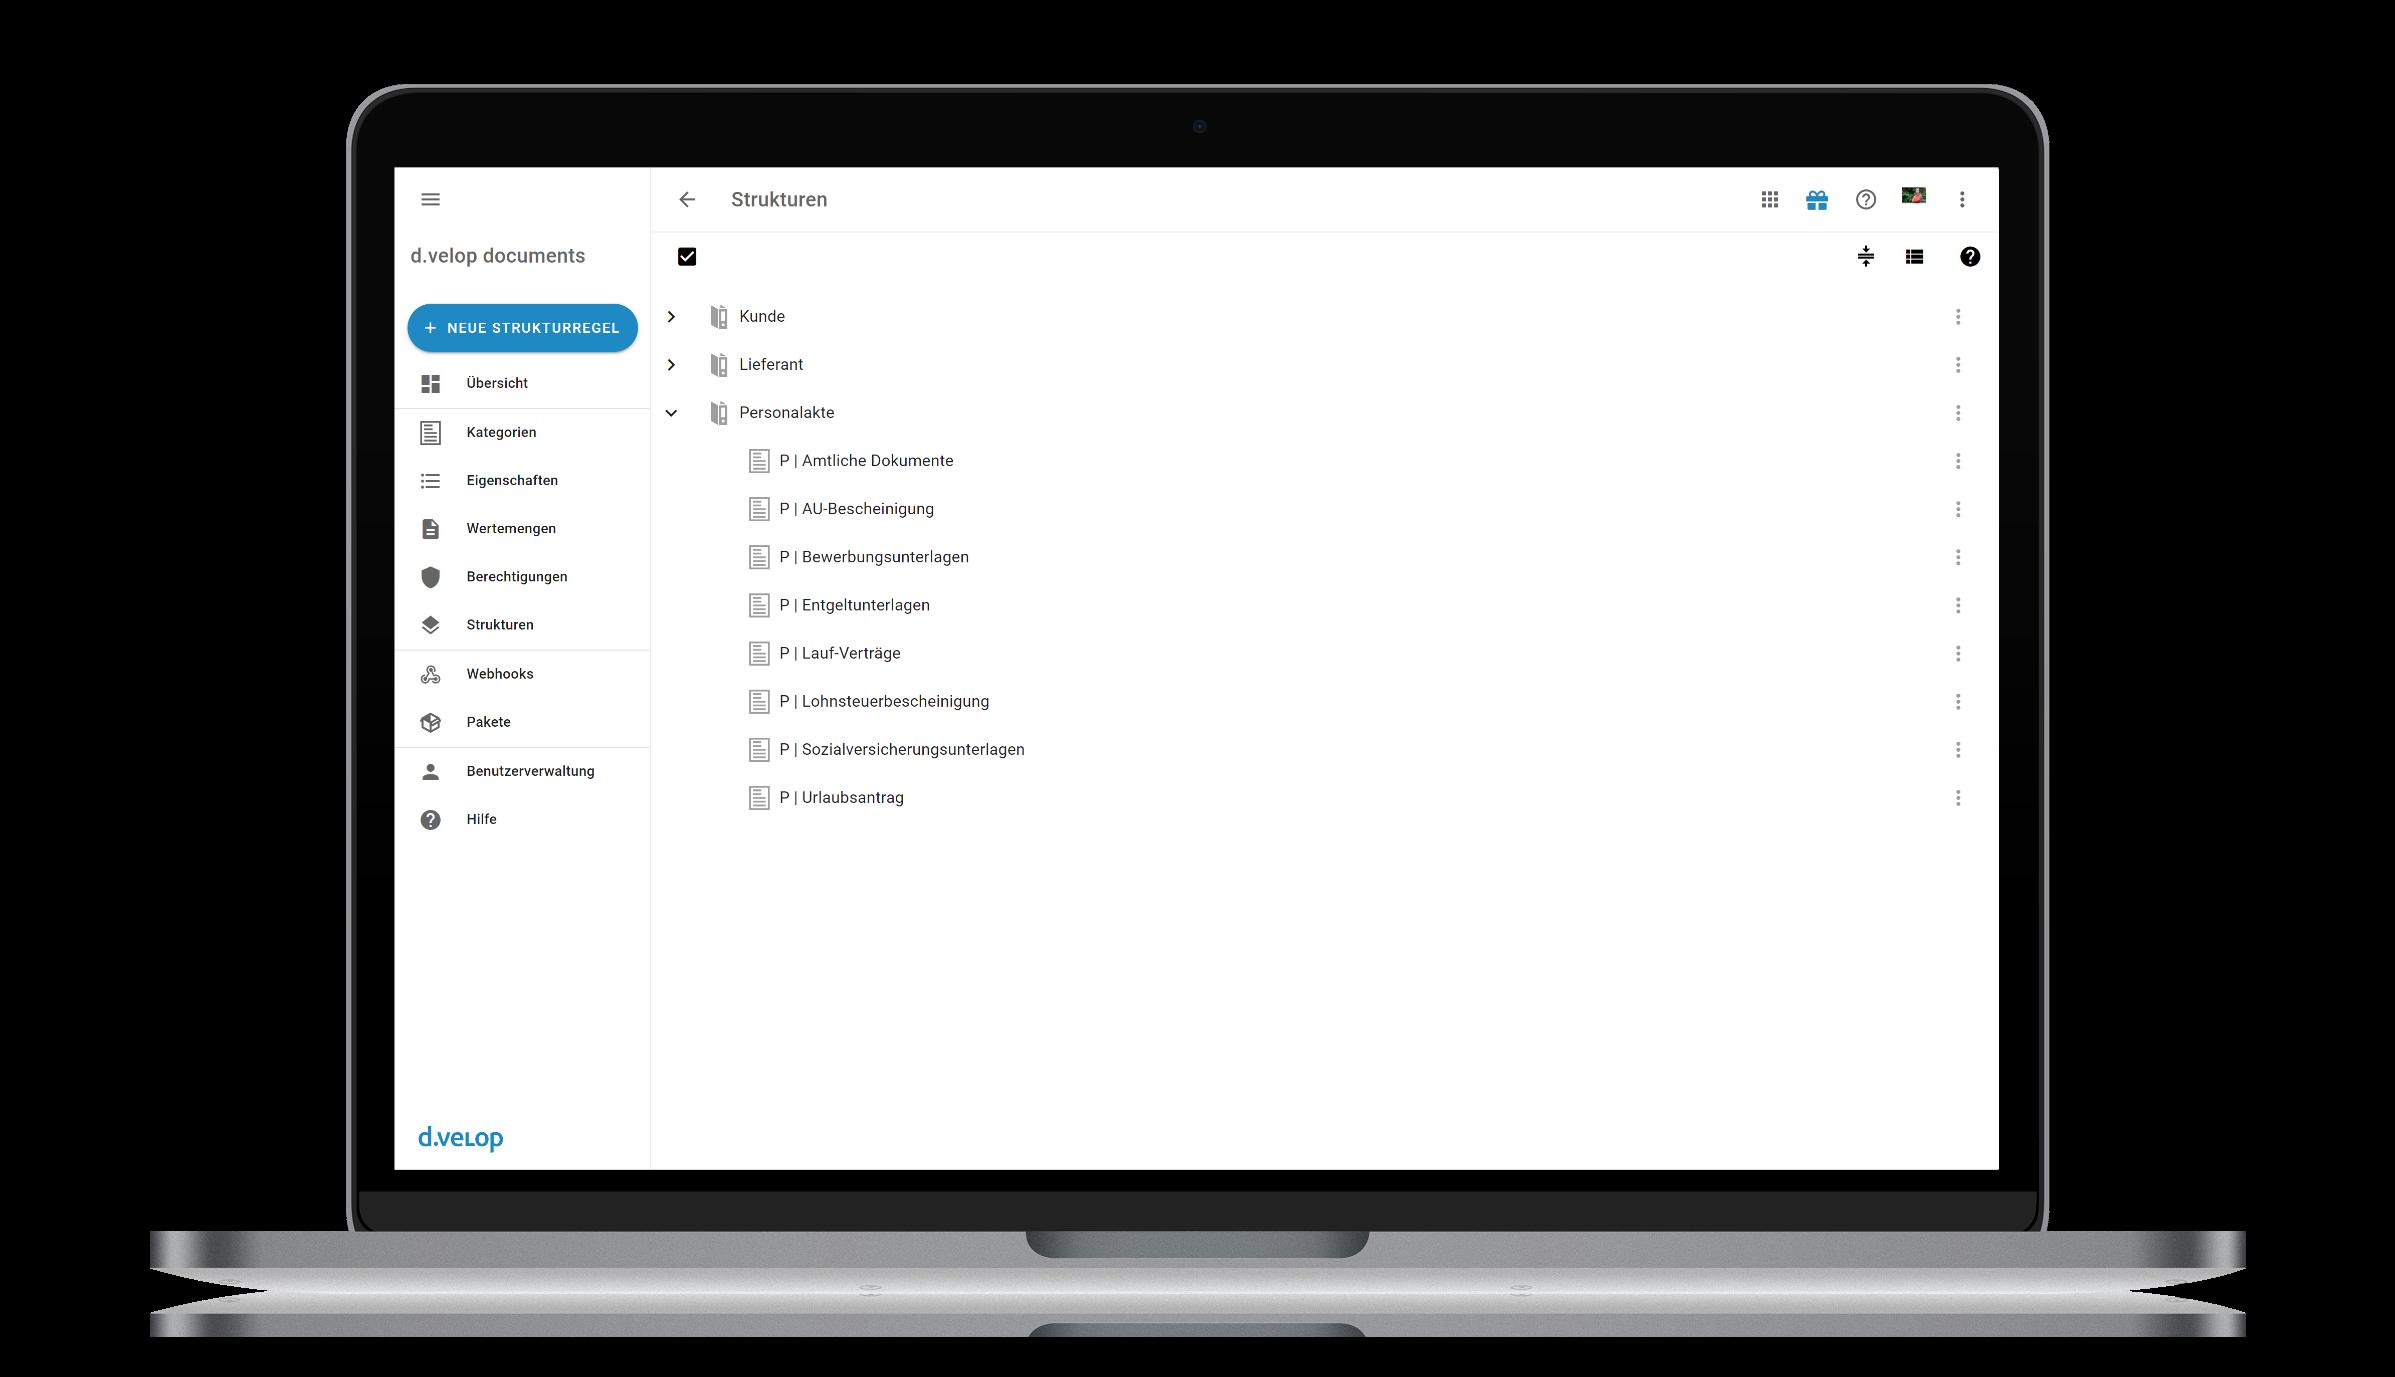 ecm:one Digitale Personalakte für DATEV